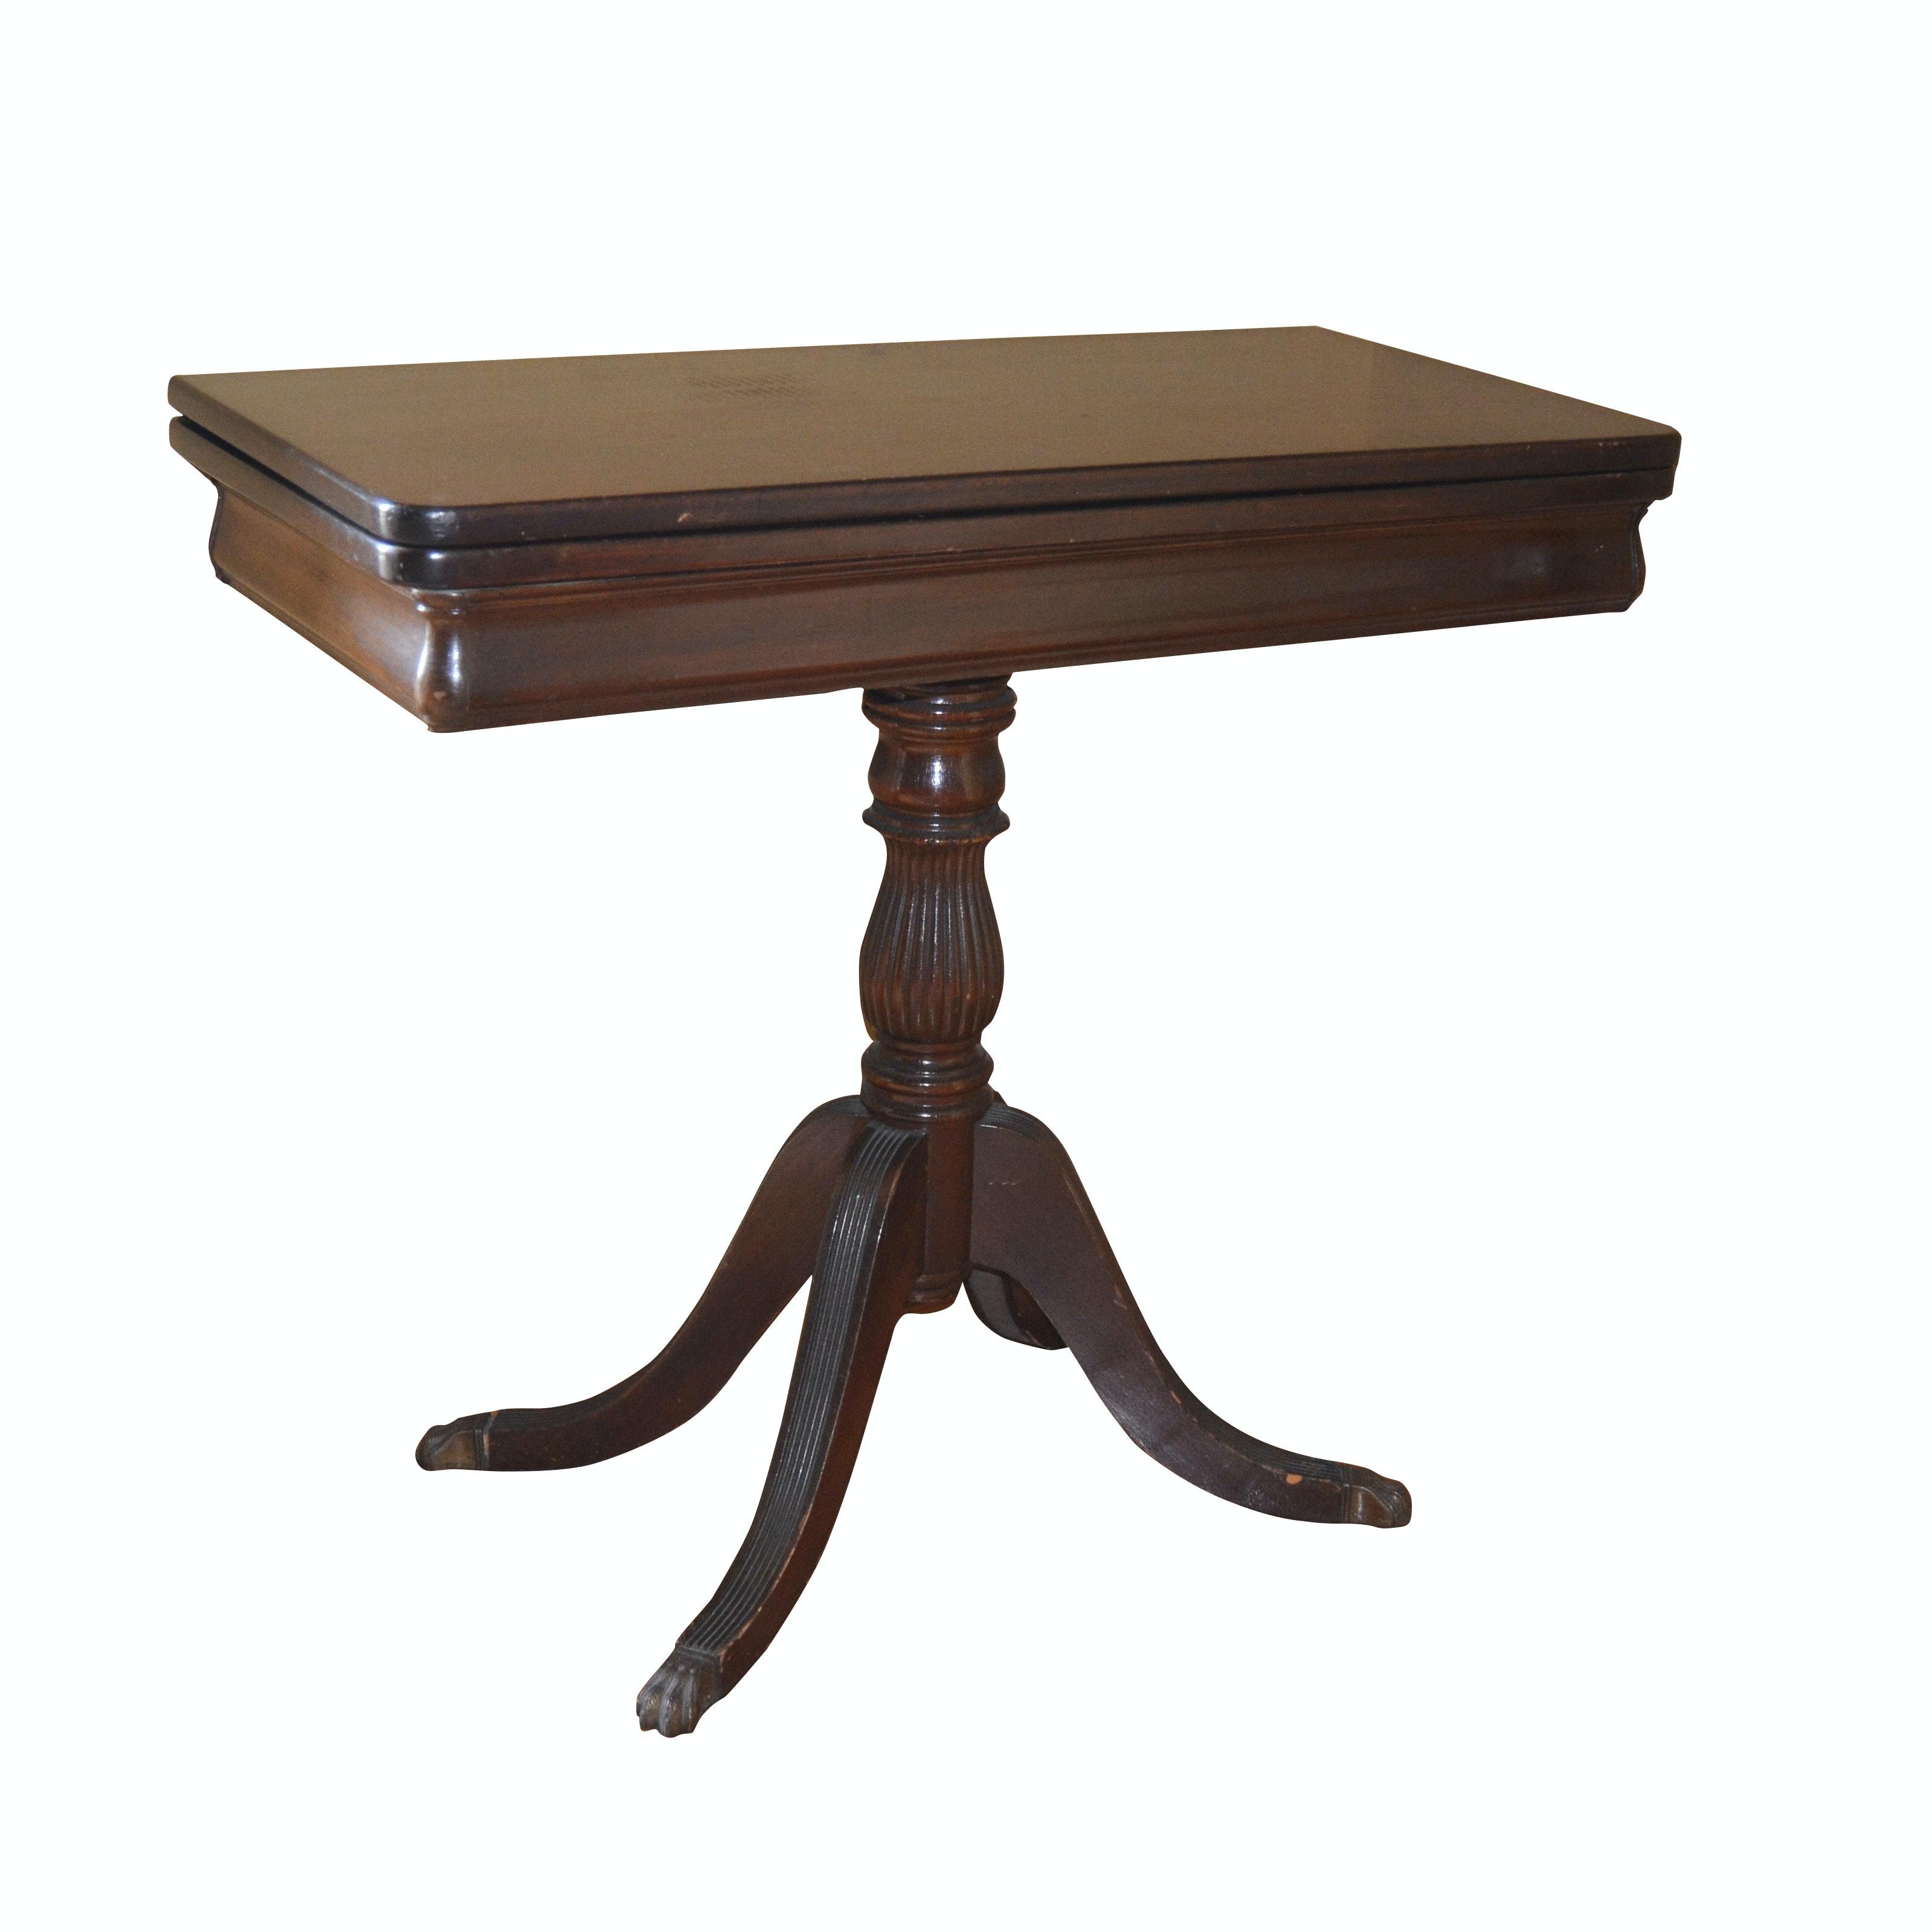 Duncan Phyfe Style Mahogany Games Table, Mid-20th Century